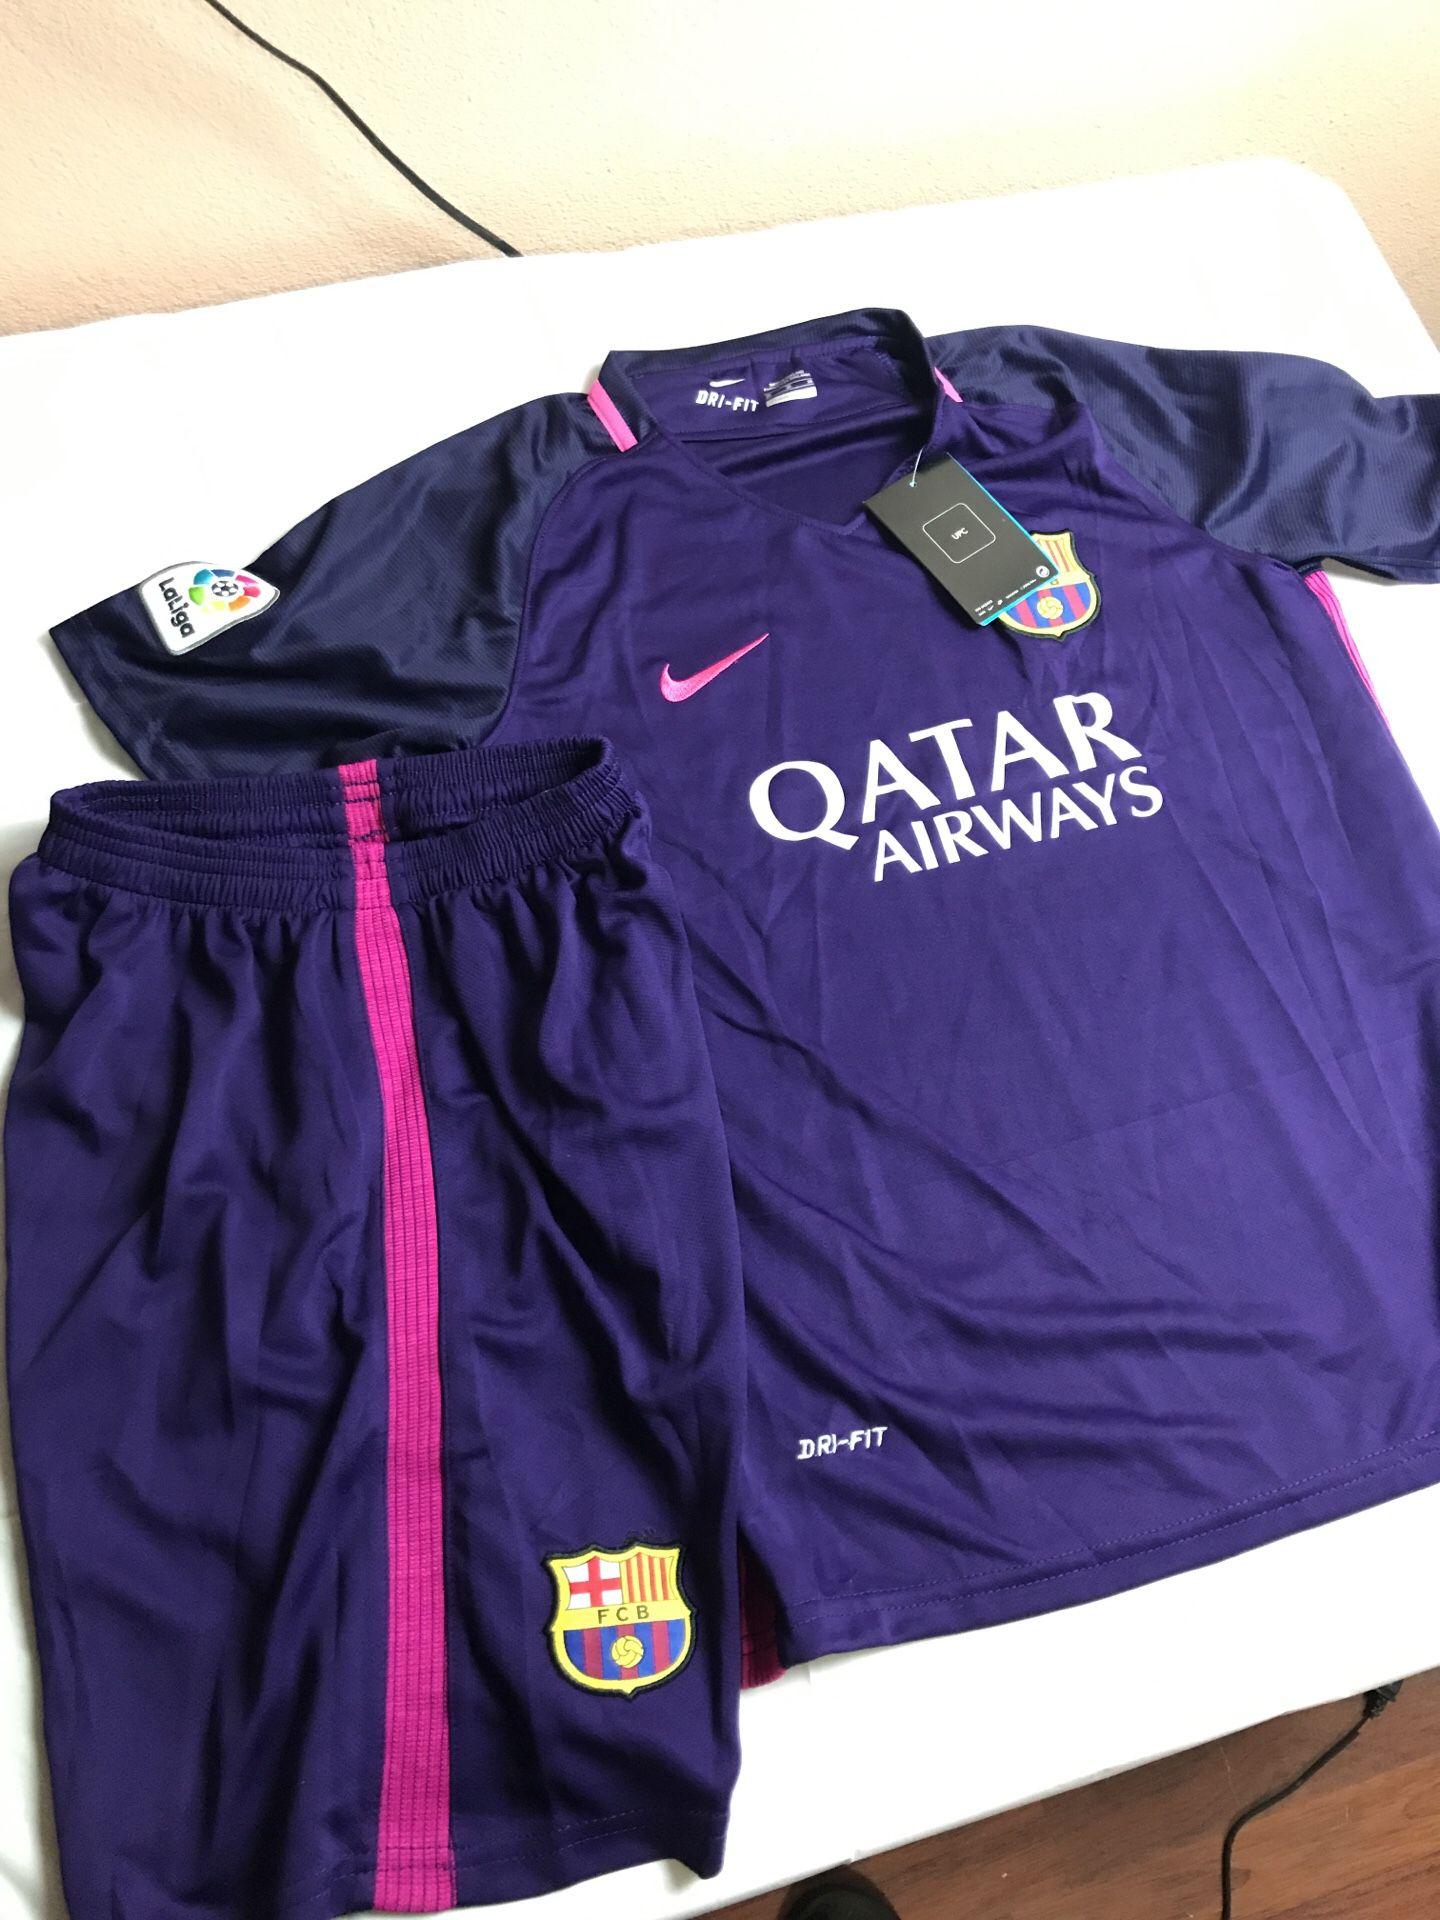 Halloween costume youth medium kids Barcelona soccer uniform